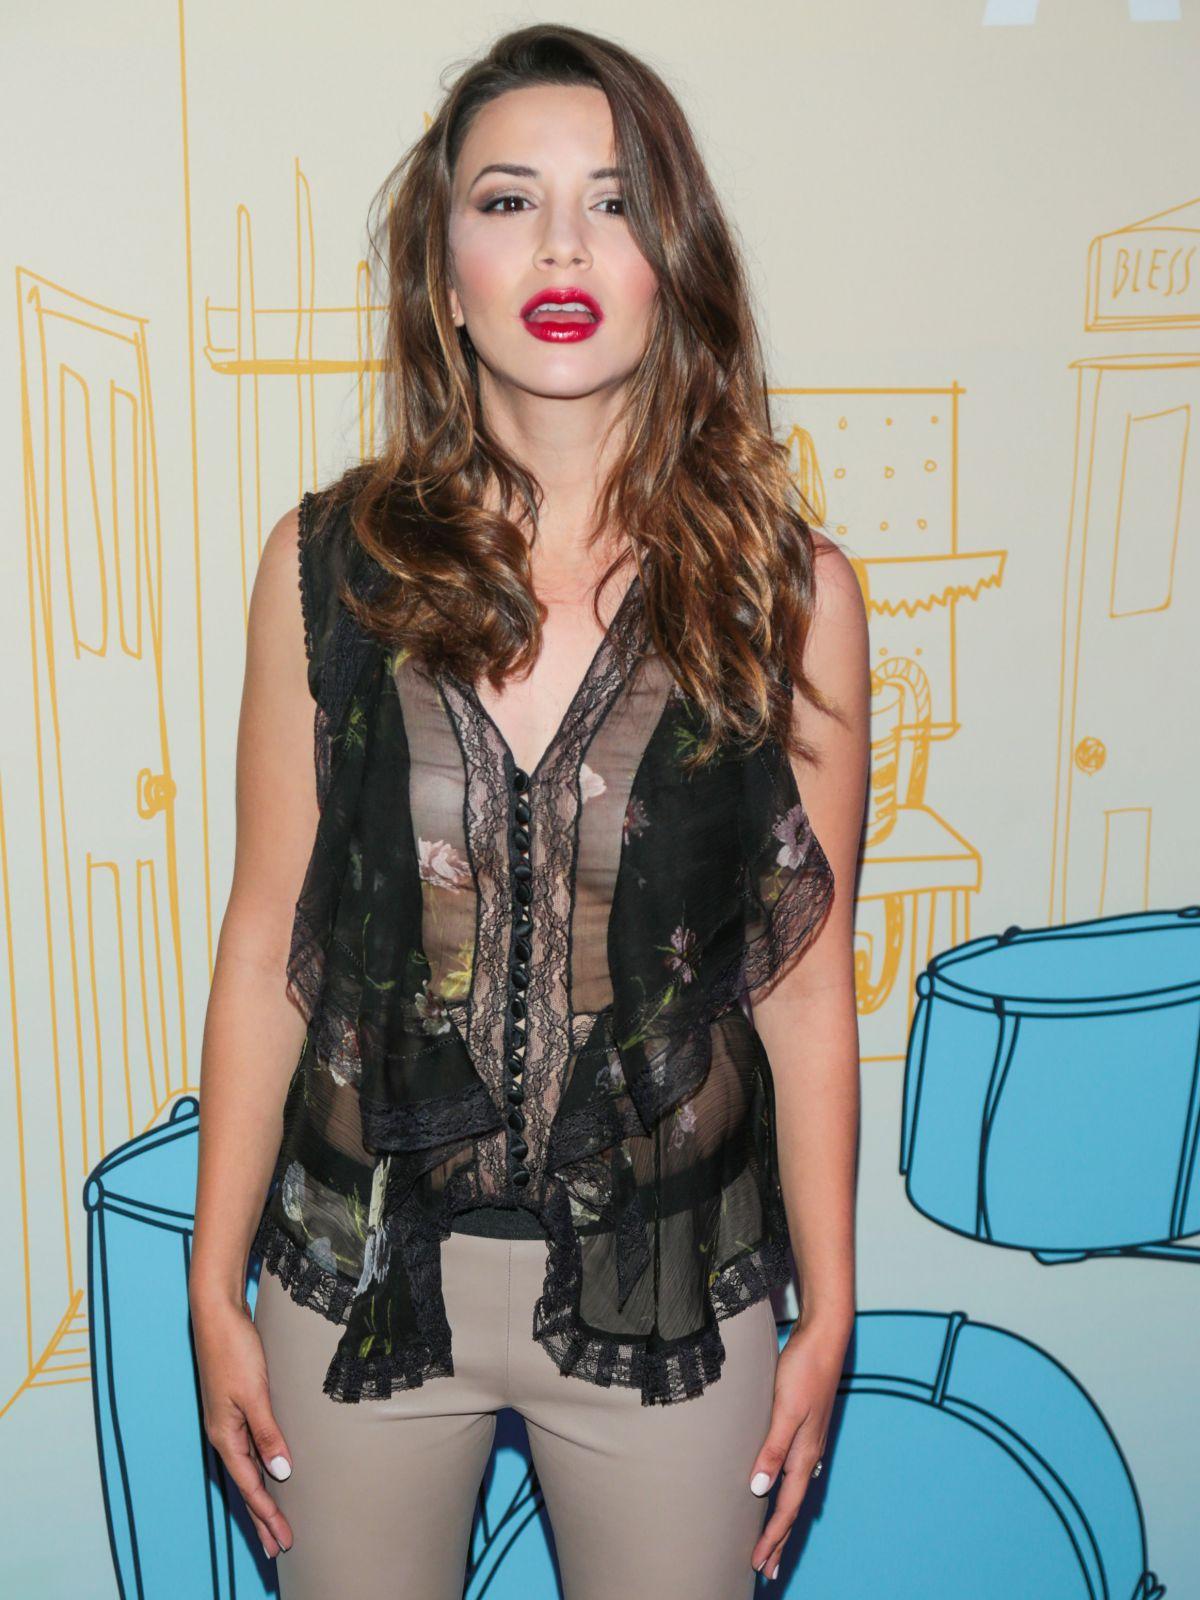 MASIELA LUSHA at Band Aid Premiere in Los Angeles 05/30